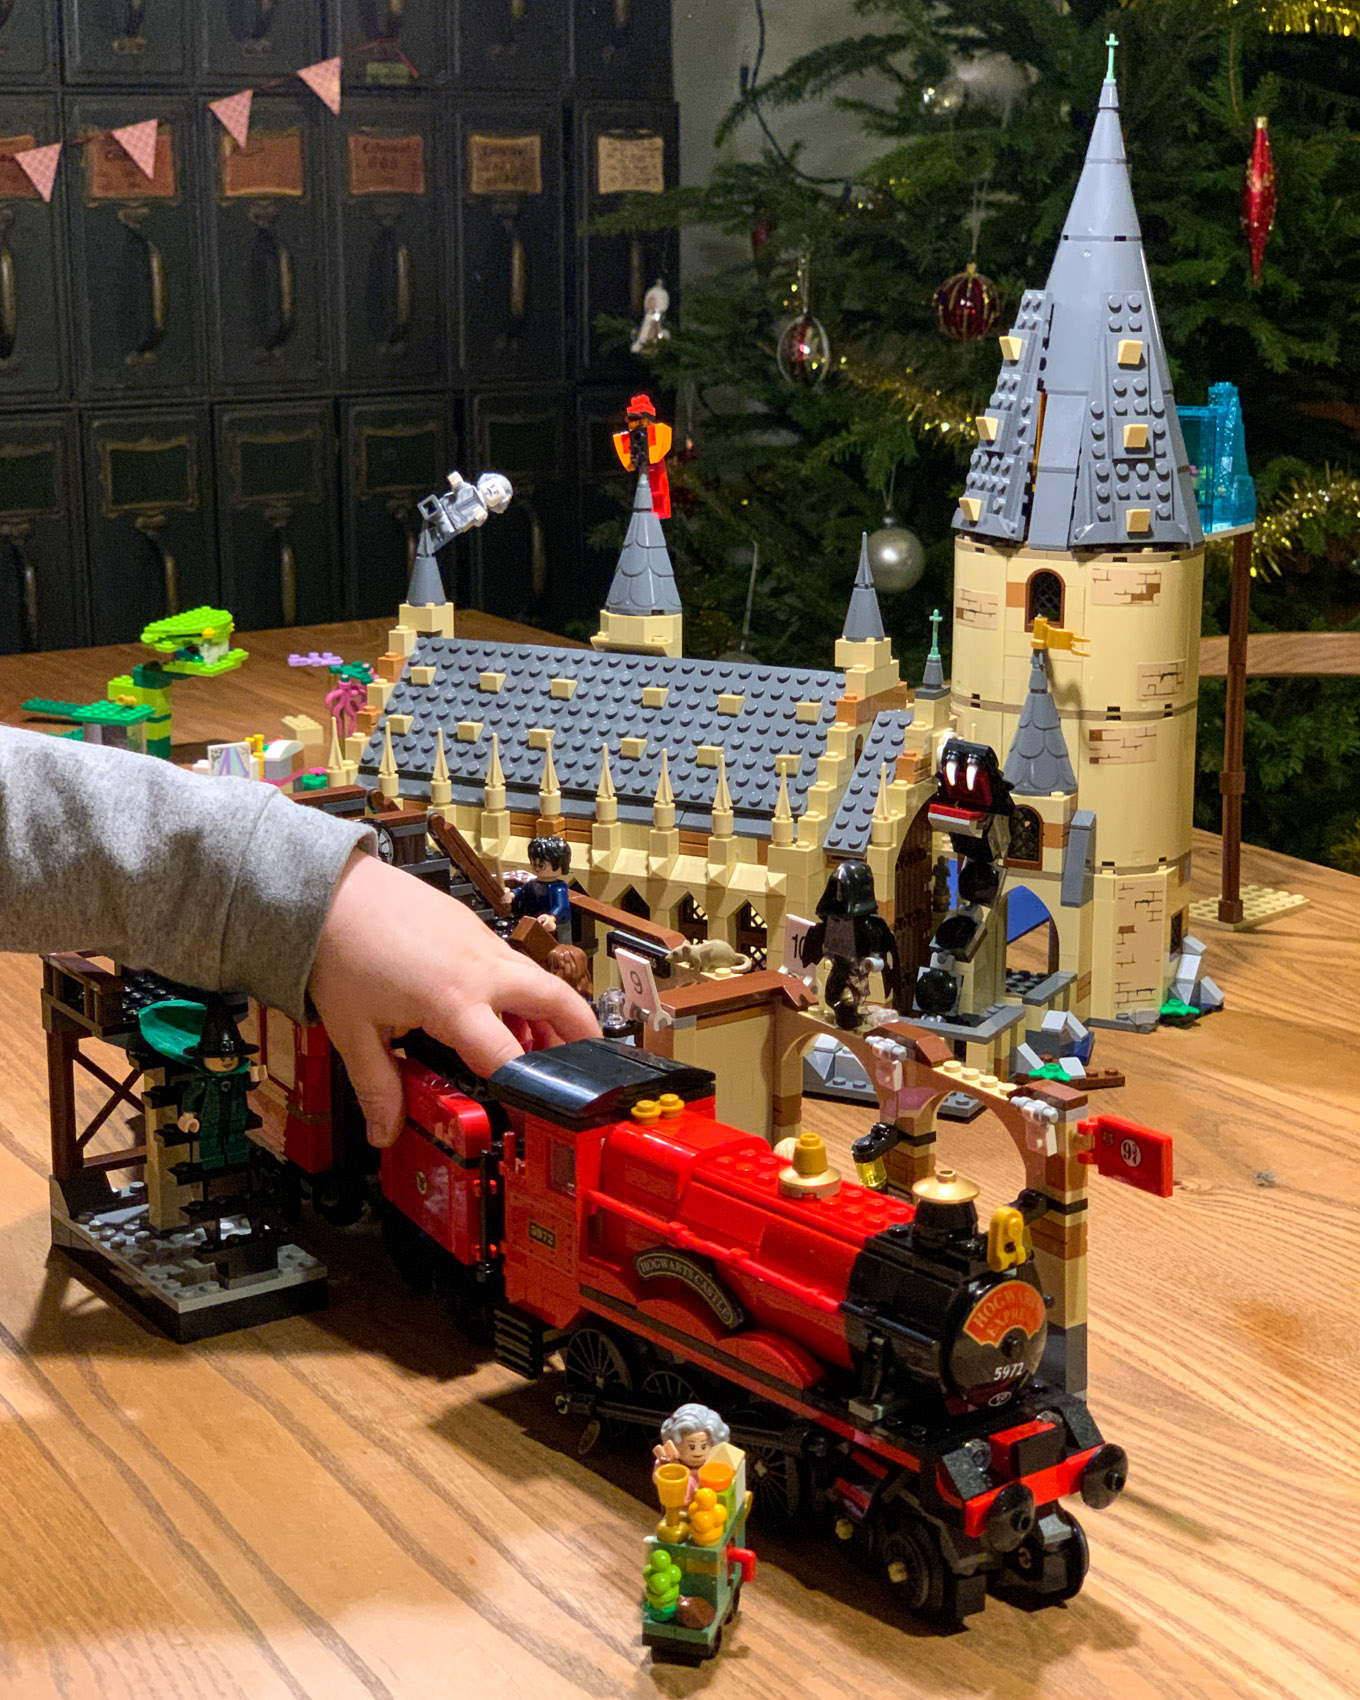 Parasta juuri nyt: Lego Harry Potter